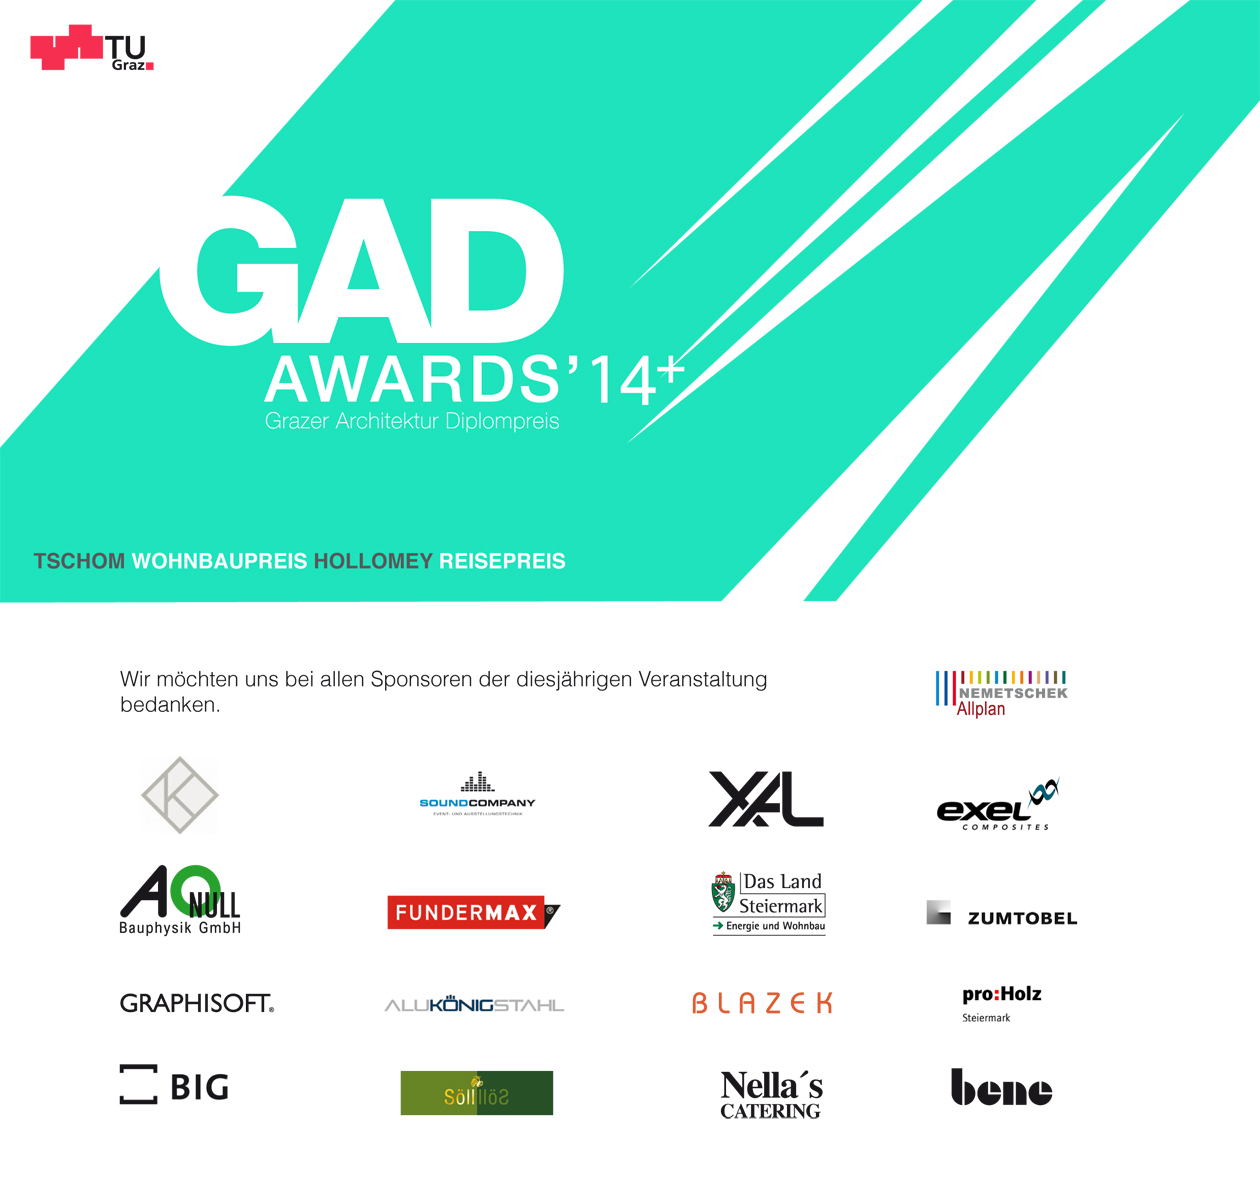 gad awards 2014 oliver schörgi erhält den tschom wohnbaupreis